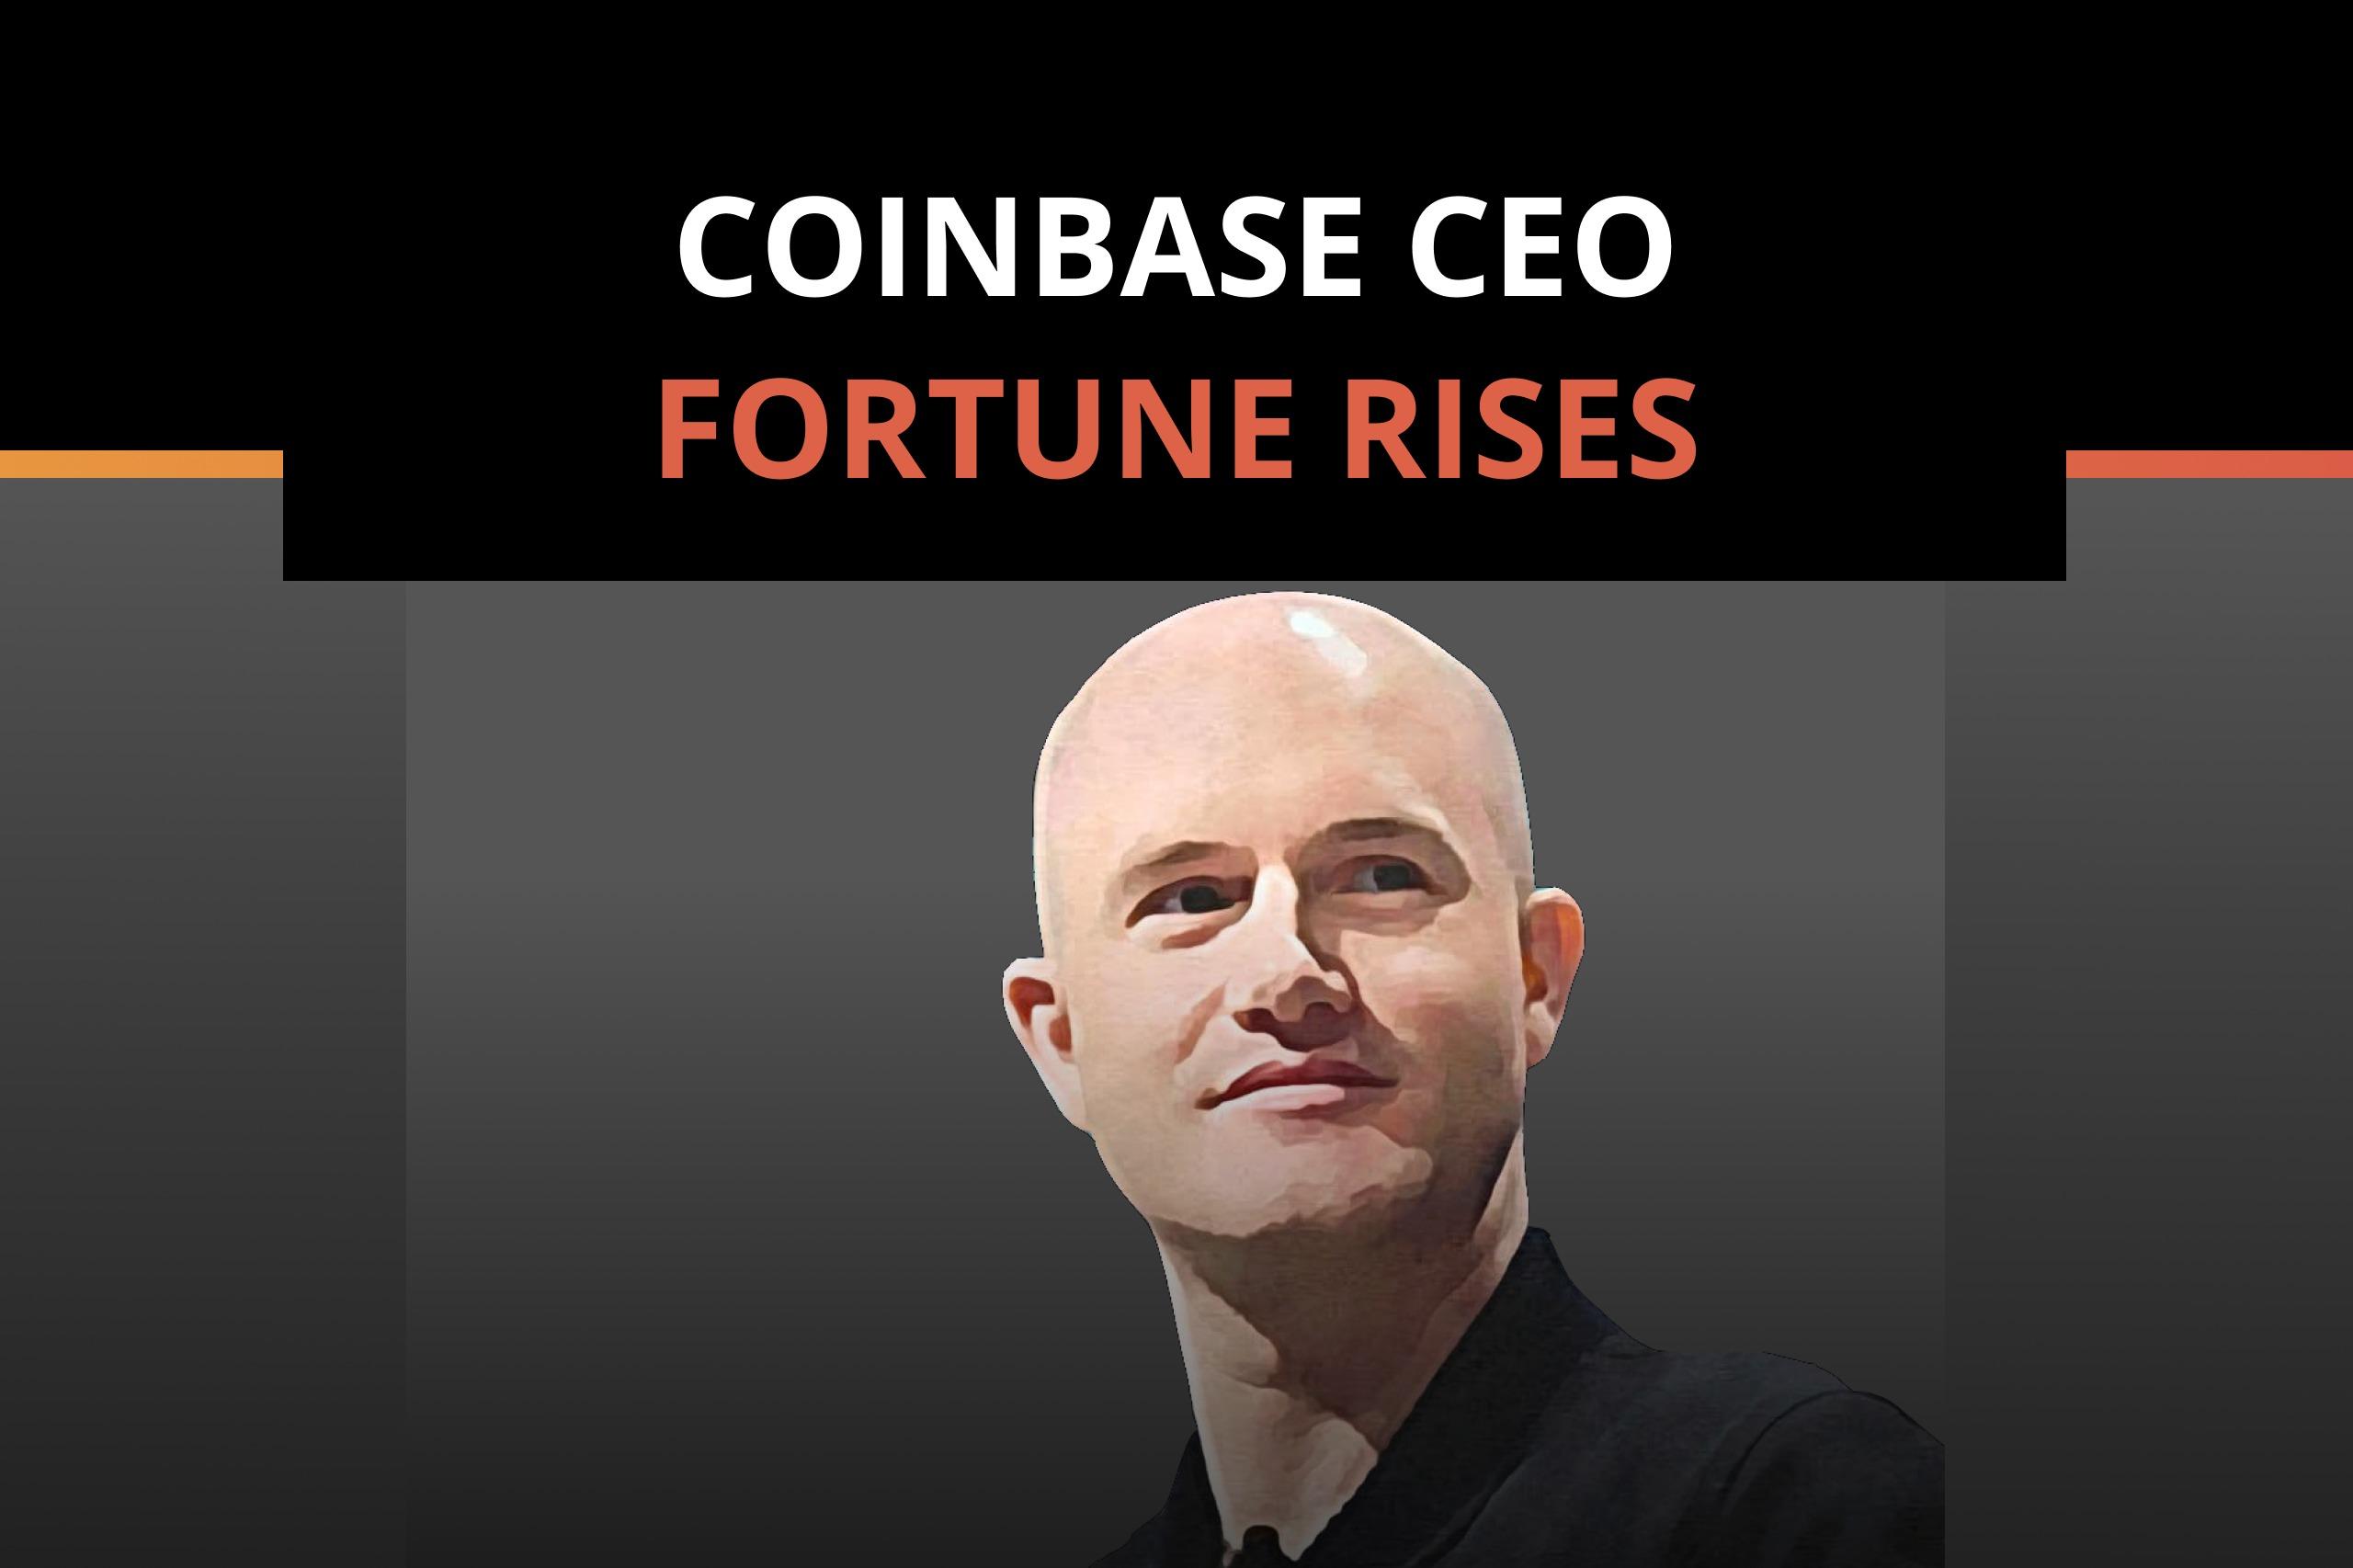 Coinbase CEO Brian Armstrong Tops Blockchain's Rich List